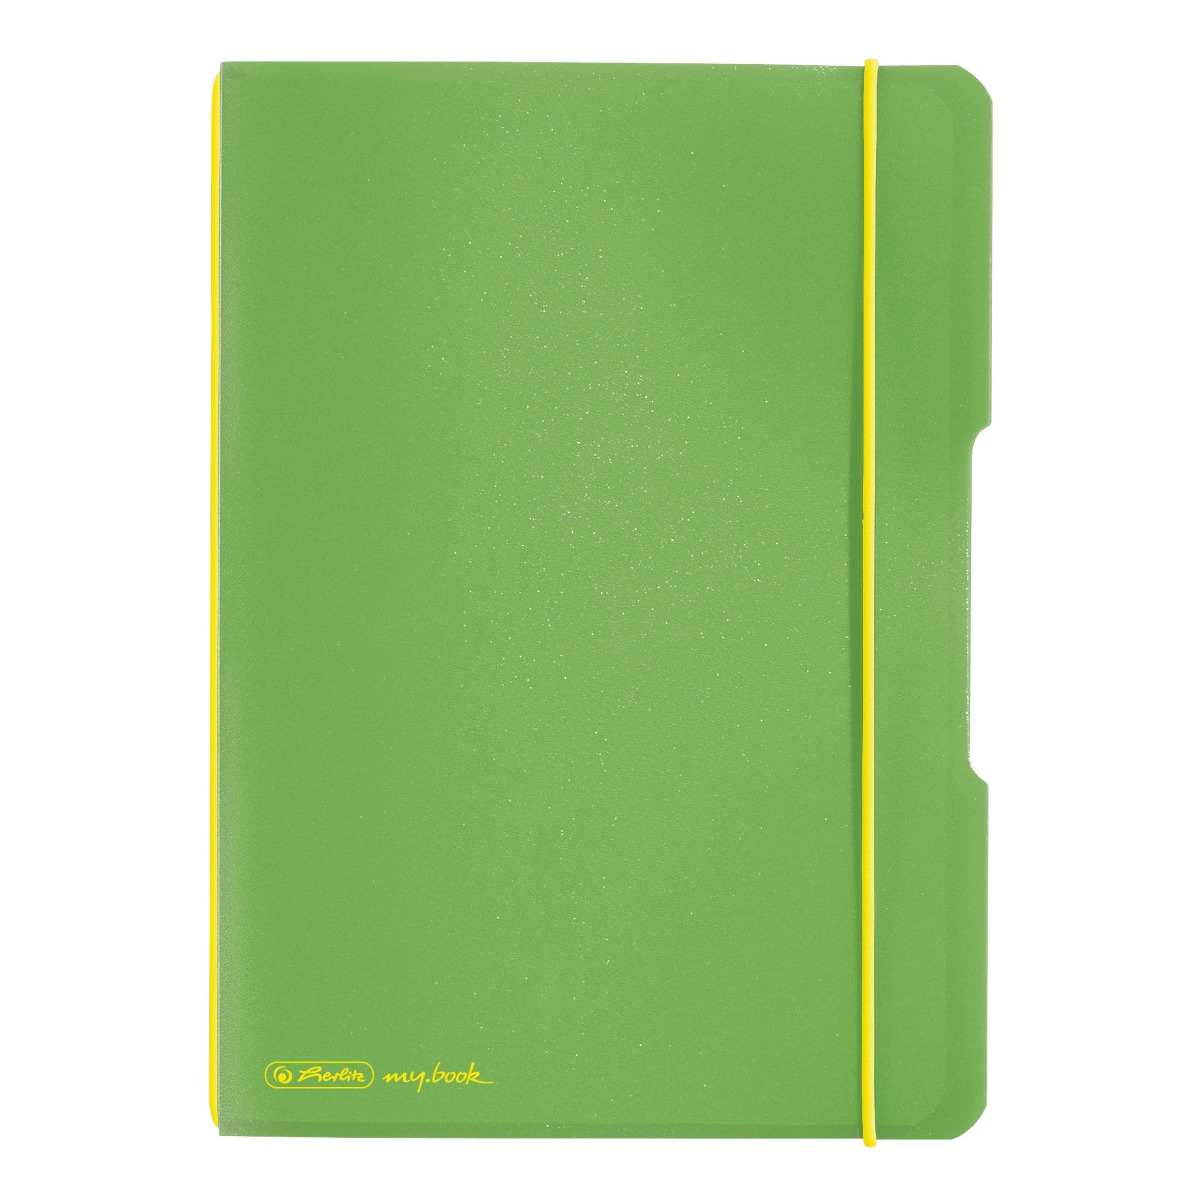 Caiet dictando Herlitz My Book Flex, A5, 40 file, Verde